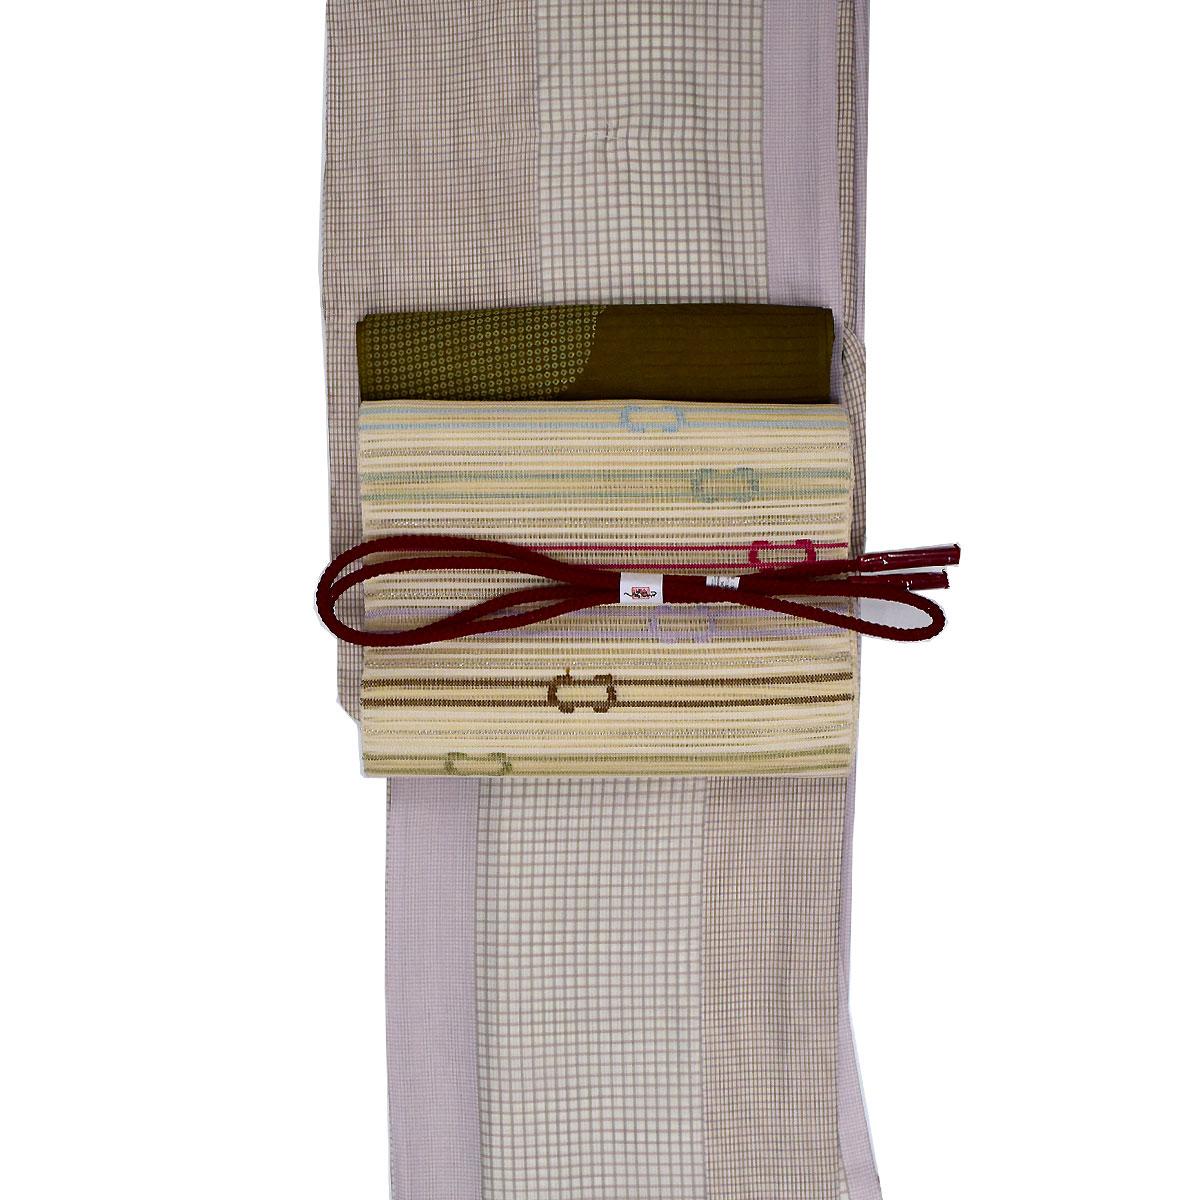 【L寸】【竪絽】【夏】洗える着物 セット洗える着物 + 正絹 絽綴れ名古屋帯 + 正絹 帯揚げ + 正絹 帯締め 番号d826-1